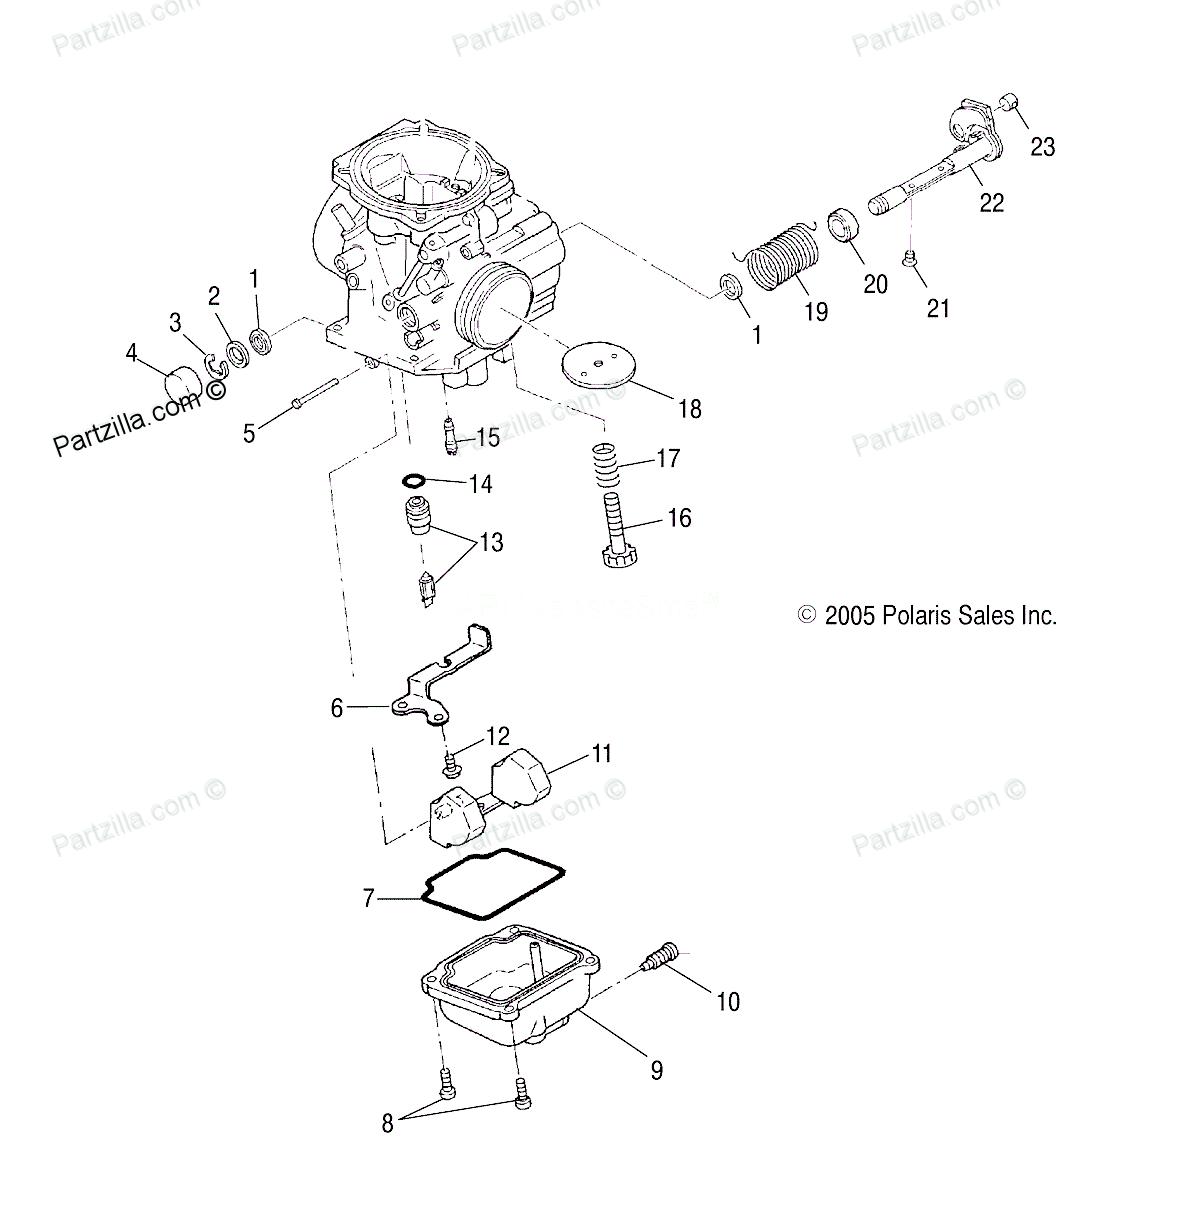 hight resolution of polaris trail boss 330 ignition wiring diagram 46 wiring 1992 polaris trail boss 250 wiring diagram